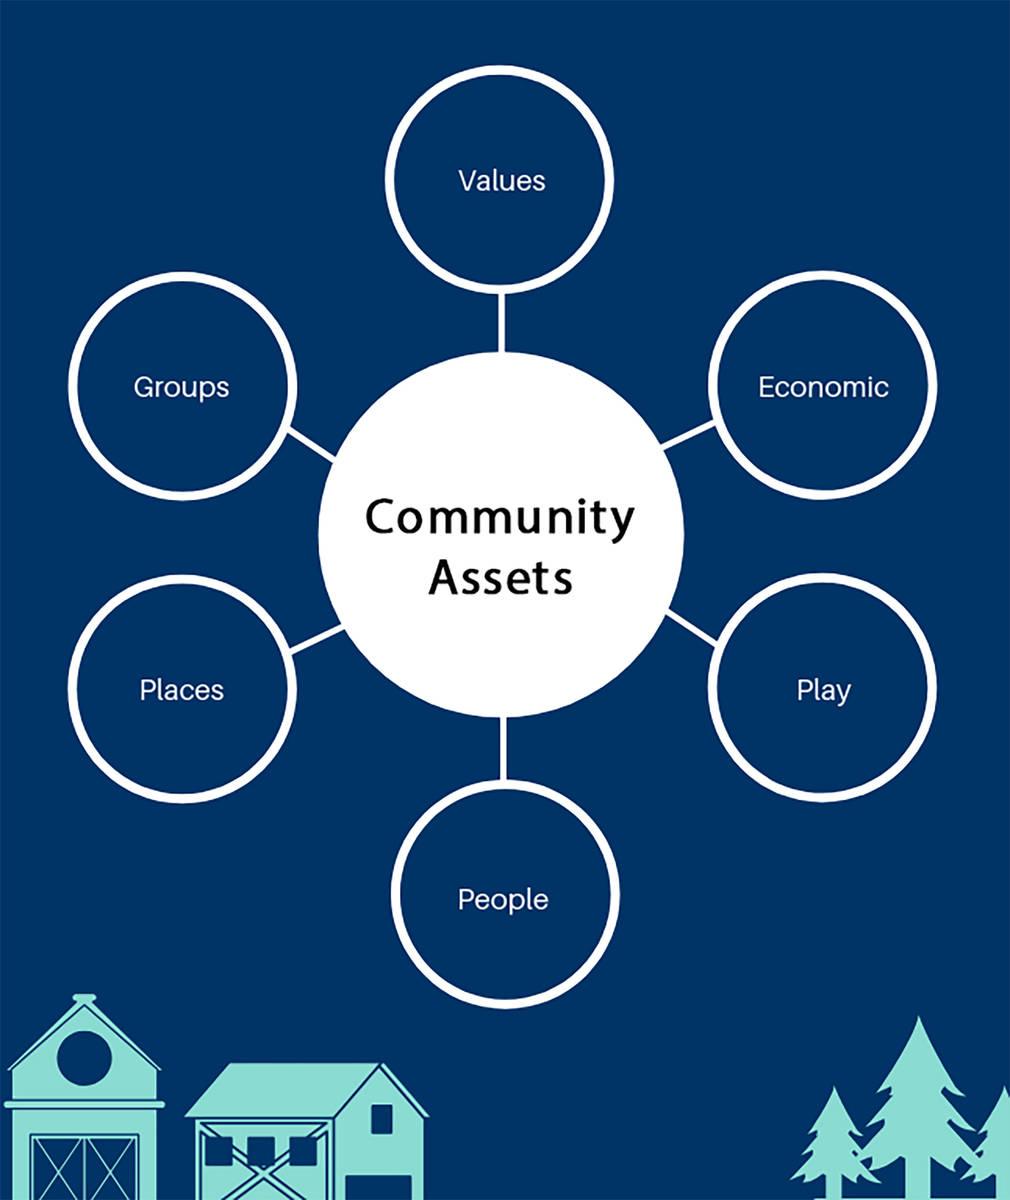 14562811_web1_Community-Assets-overview.jpg